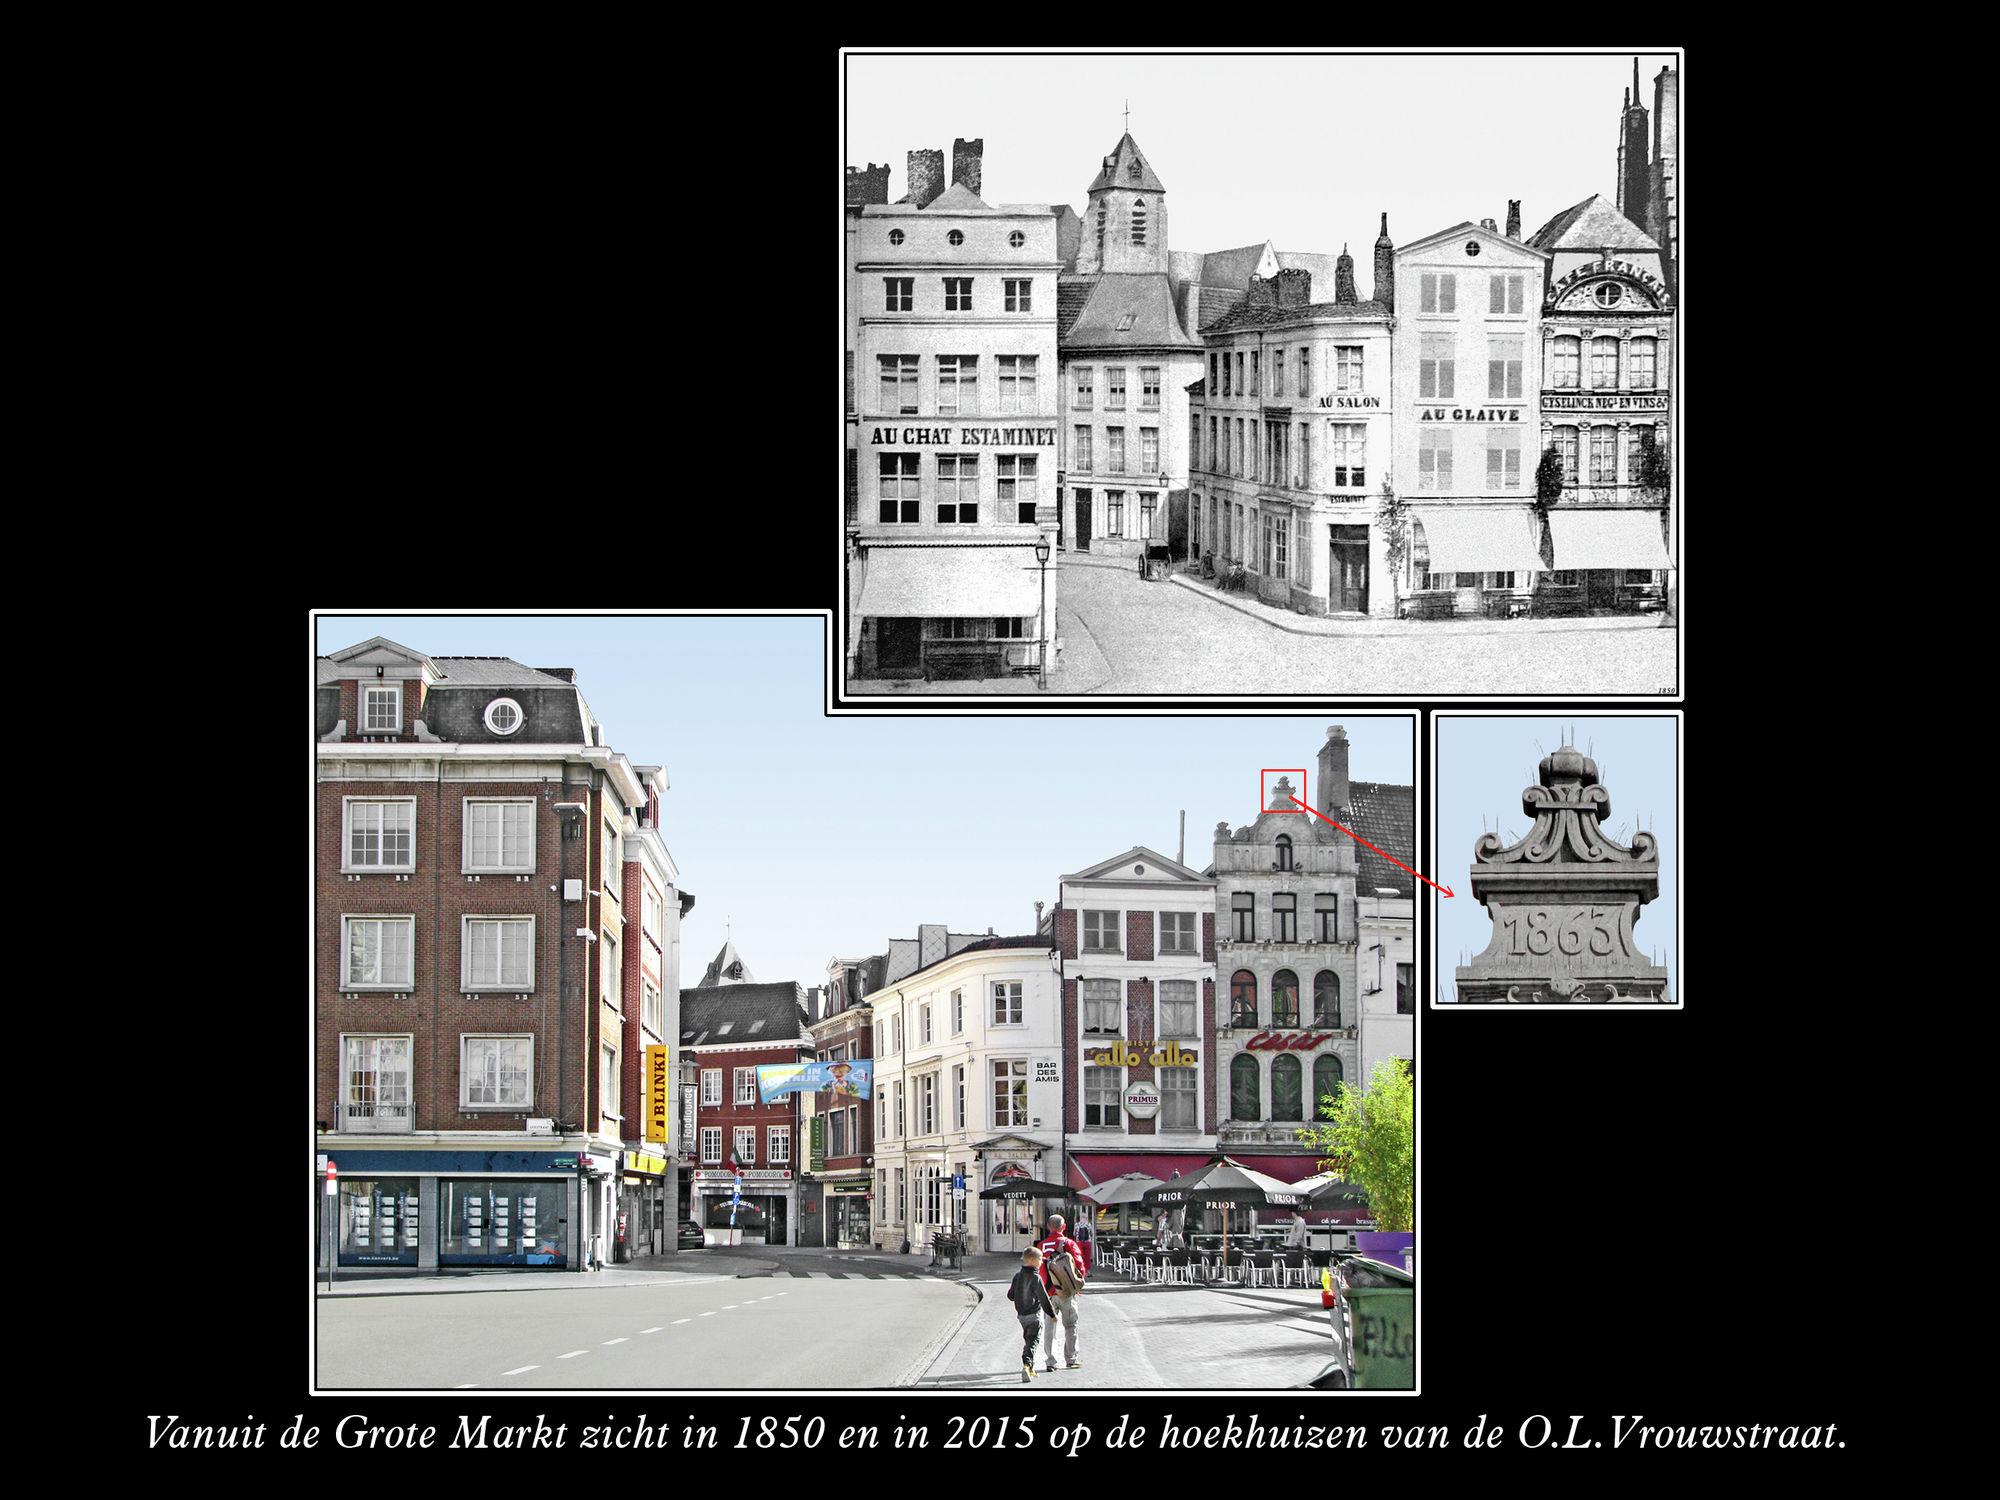 Hoekhuizen O.L.Vrouwestraat 1850 en 2015